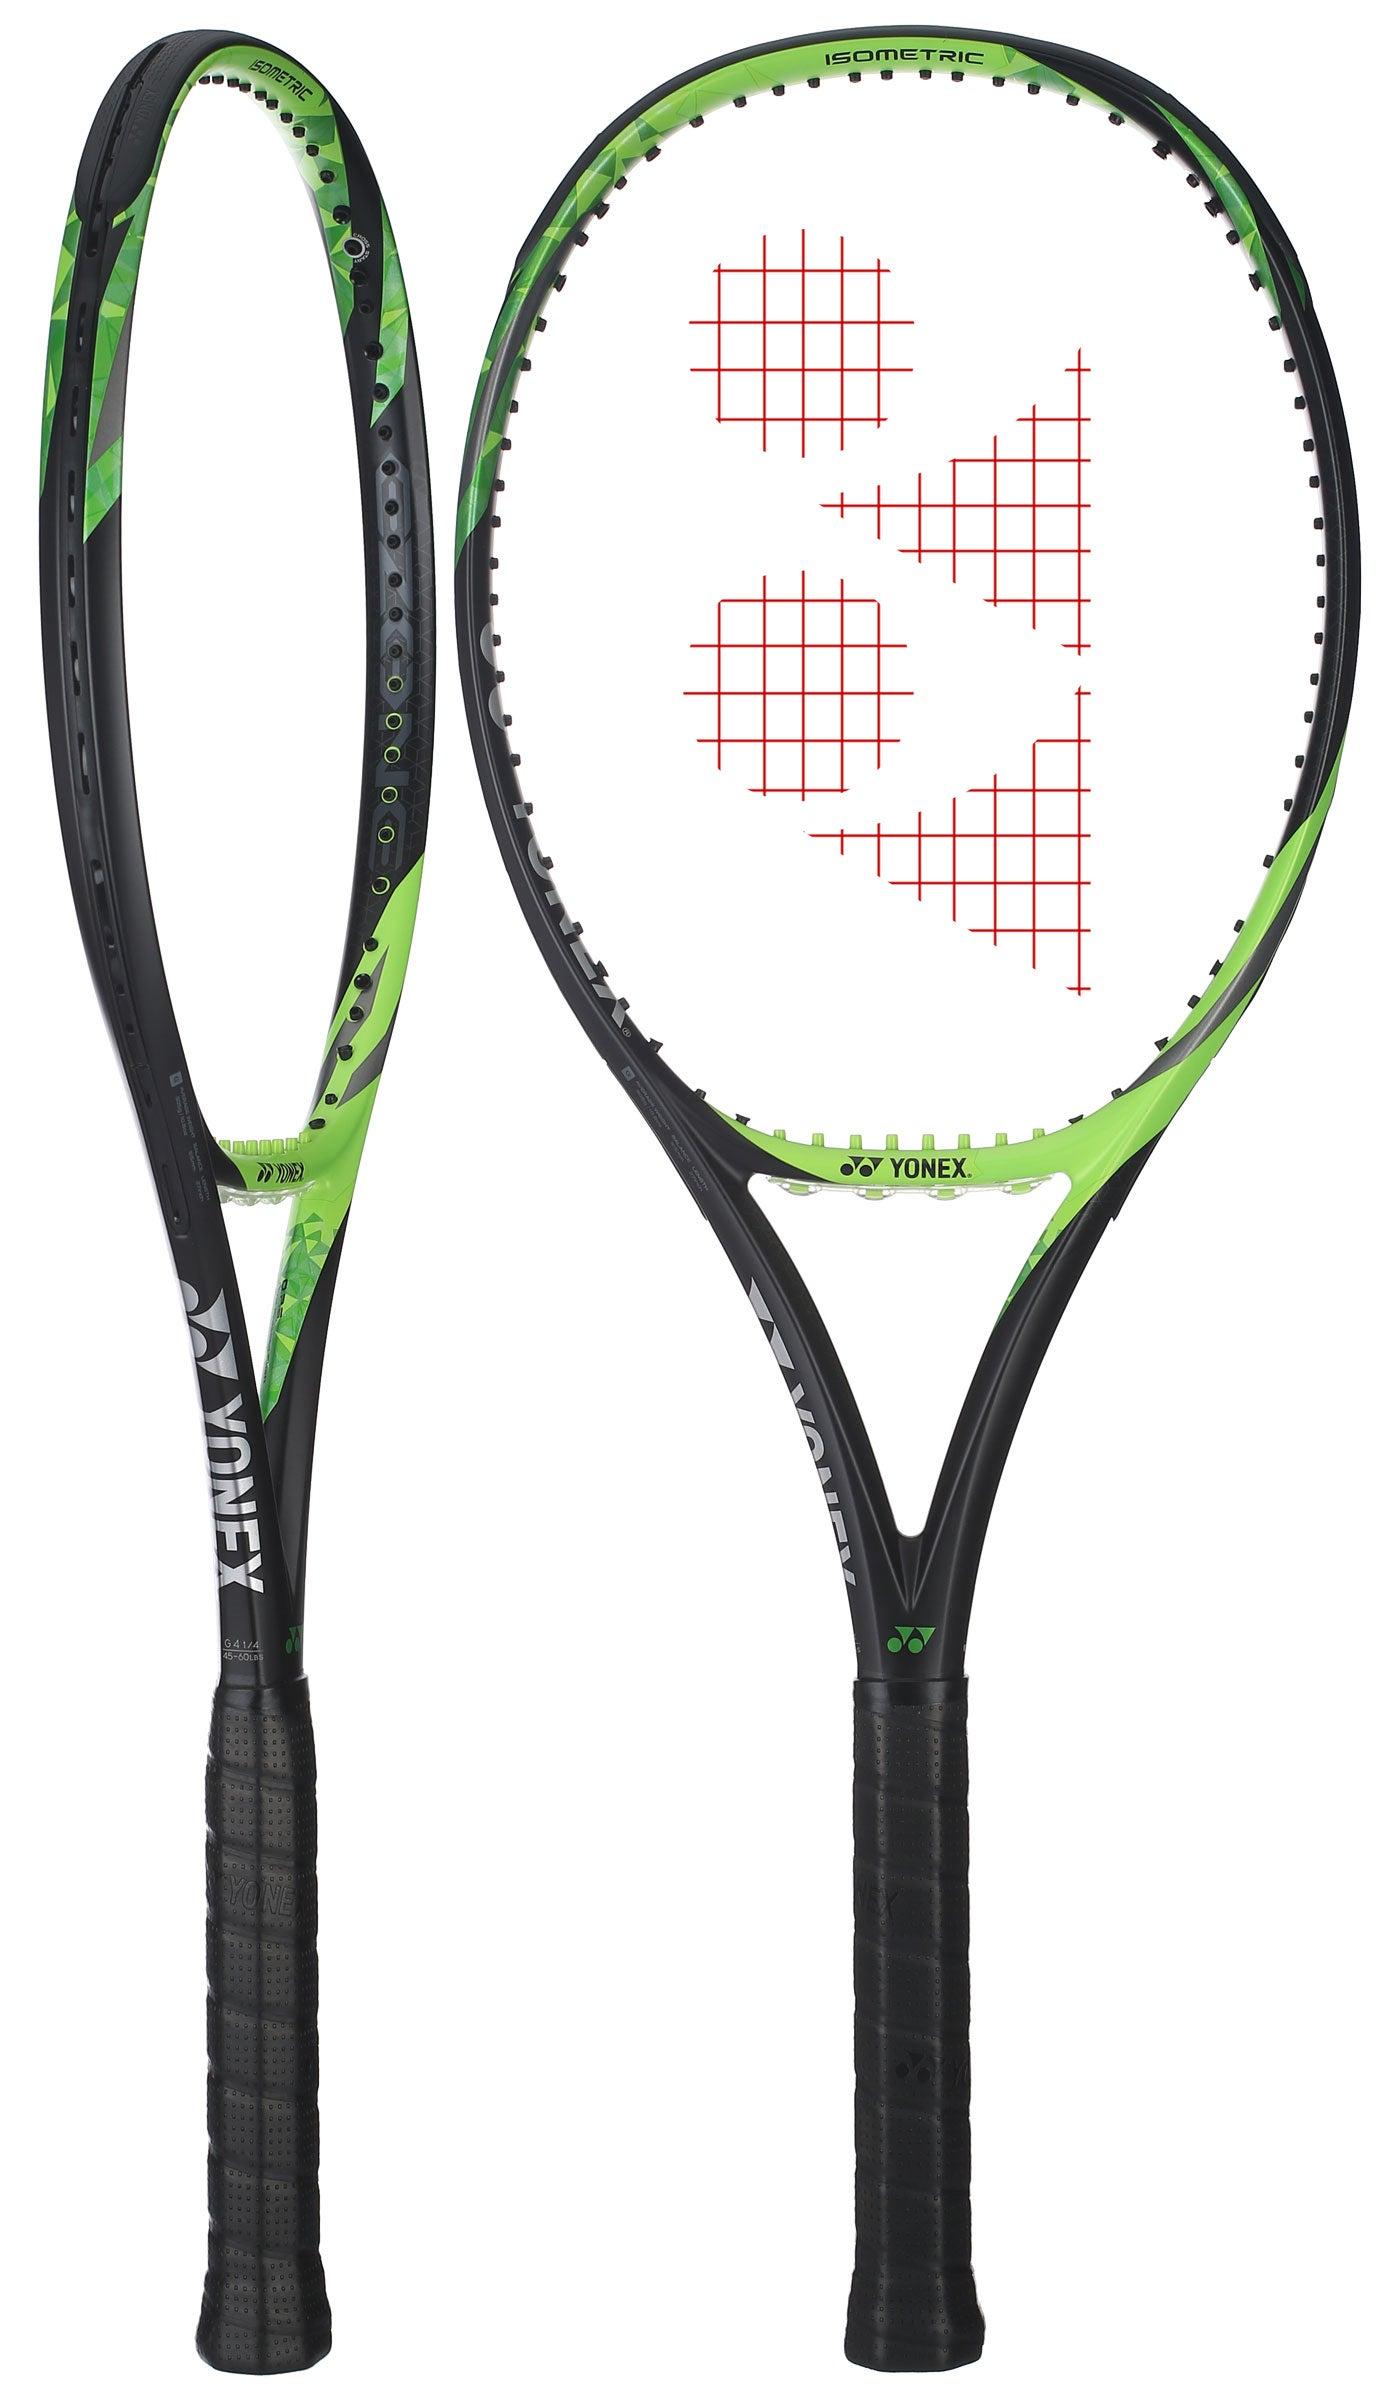 Racchetta Yonex EZONE 98 (305g) - Tennis Warehouse Europe